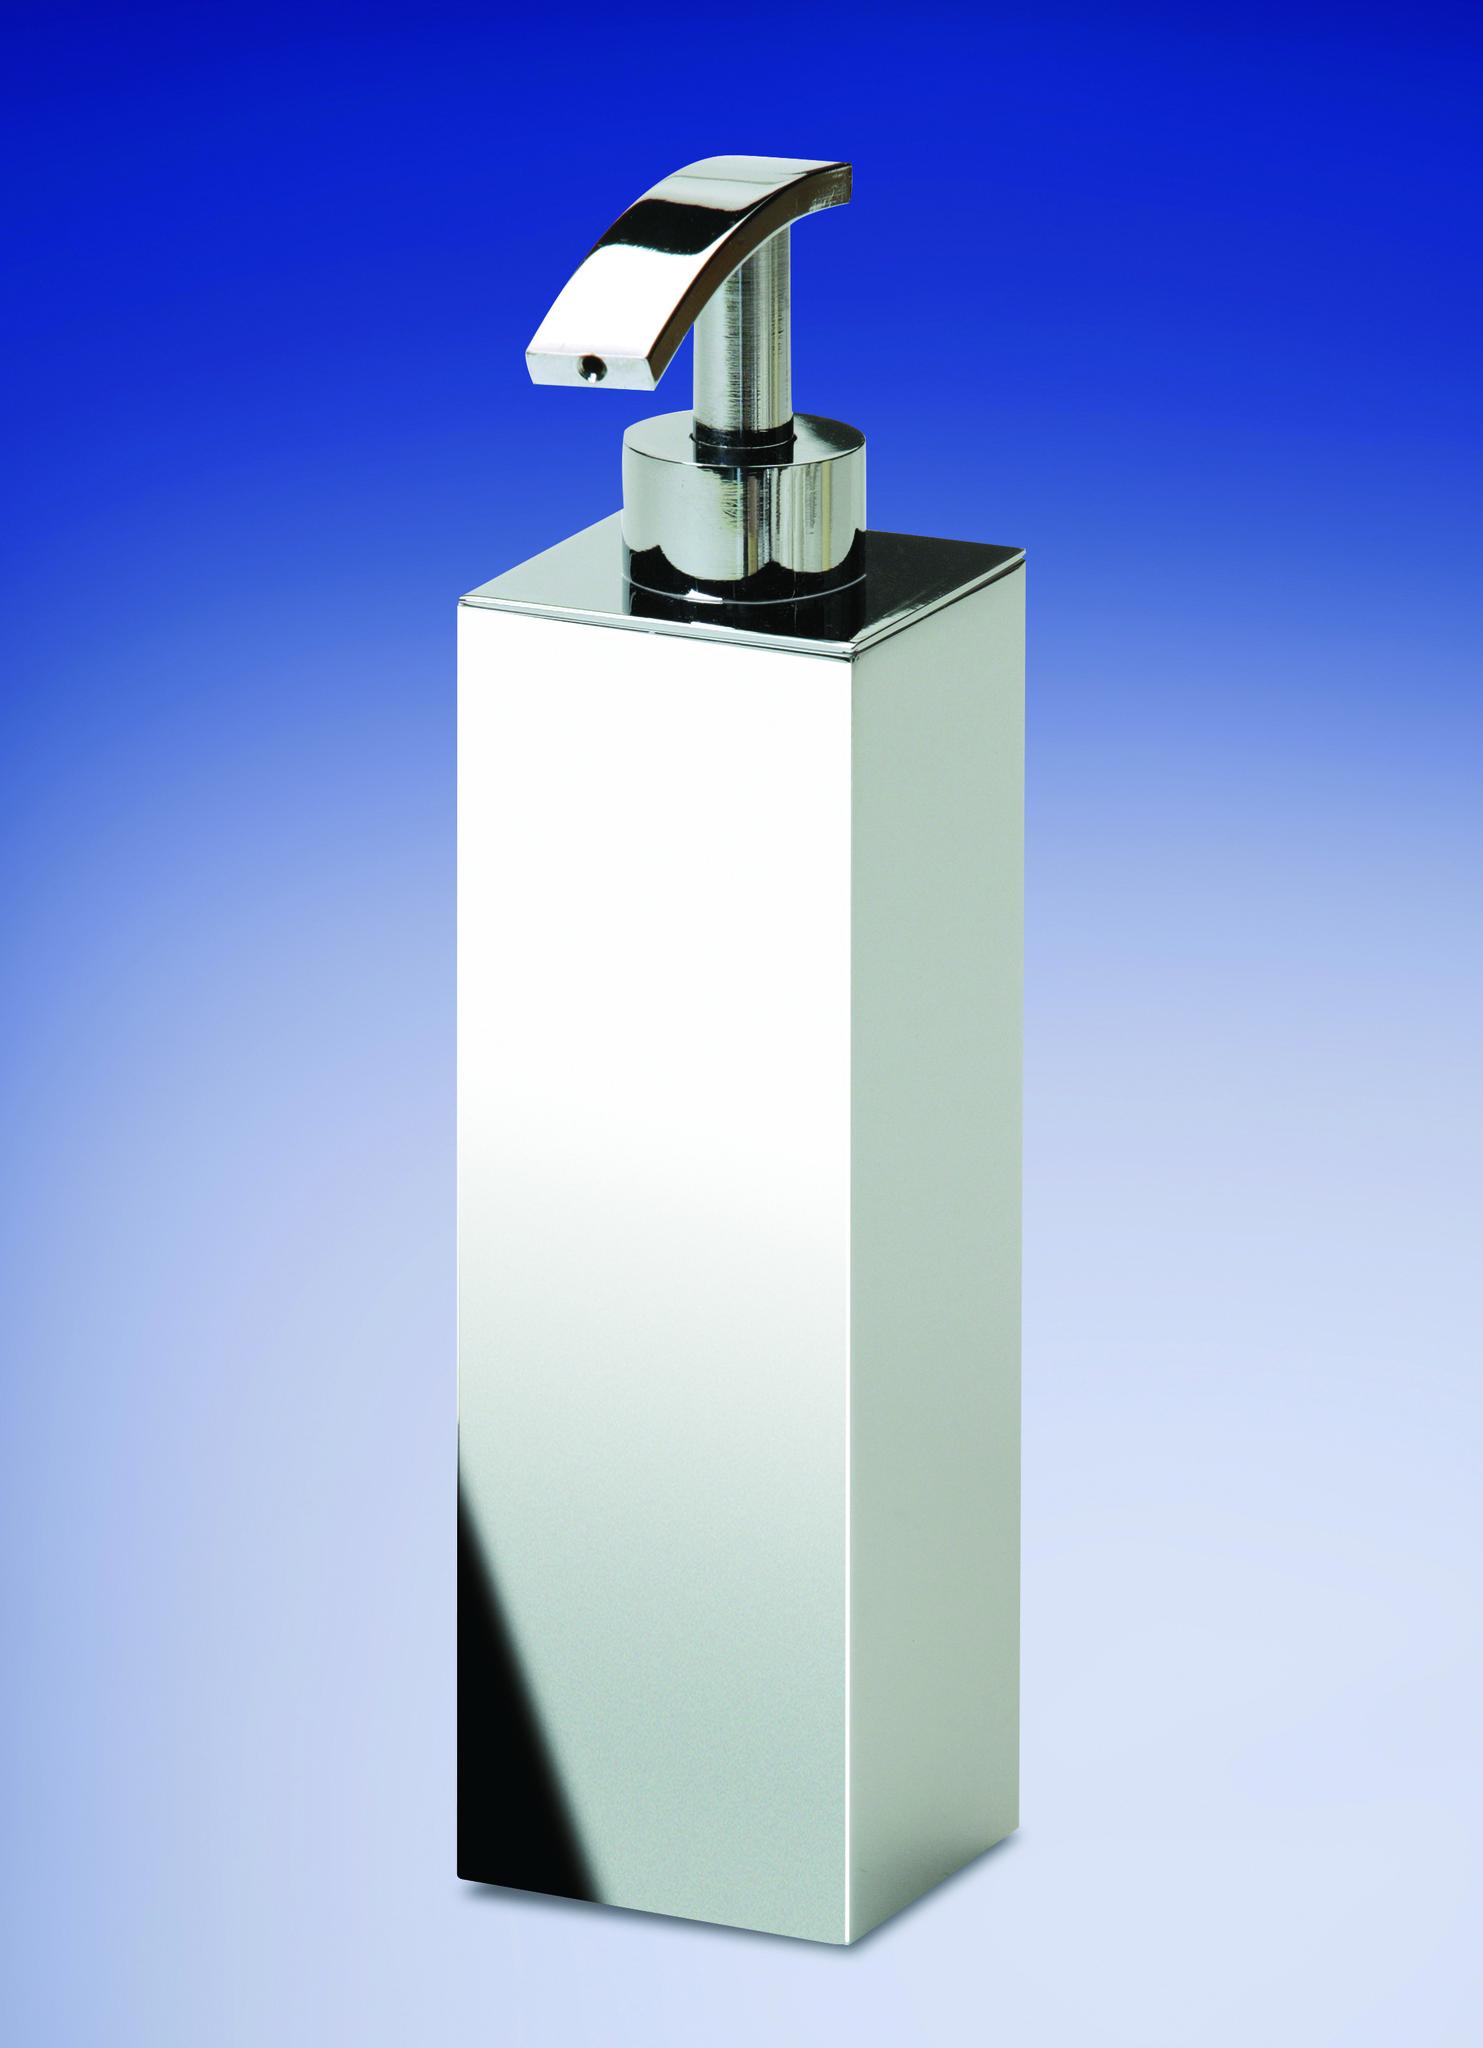 Дозаторы для мыла Дозатор настольный Windisch 90102CR Metal Lineal dispenser-nastolnyy-90102-metal-lineal-ot-windisch-ispaniya.jpg